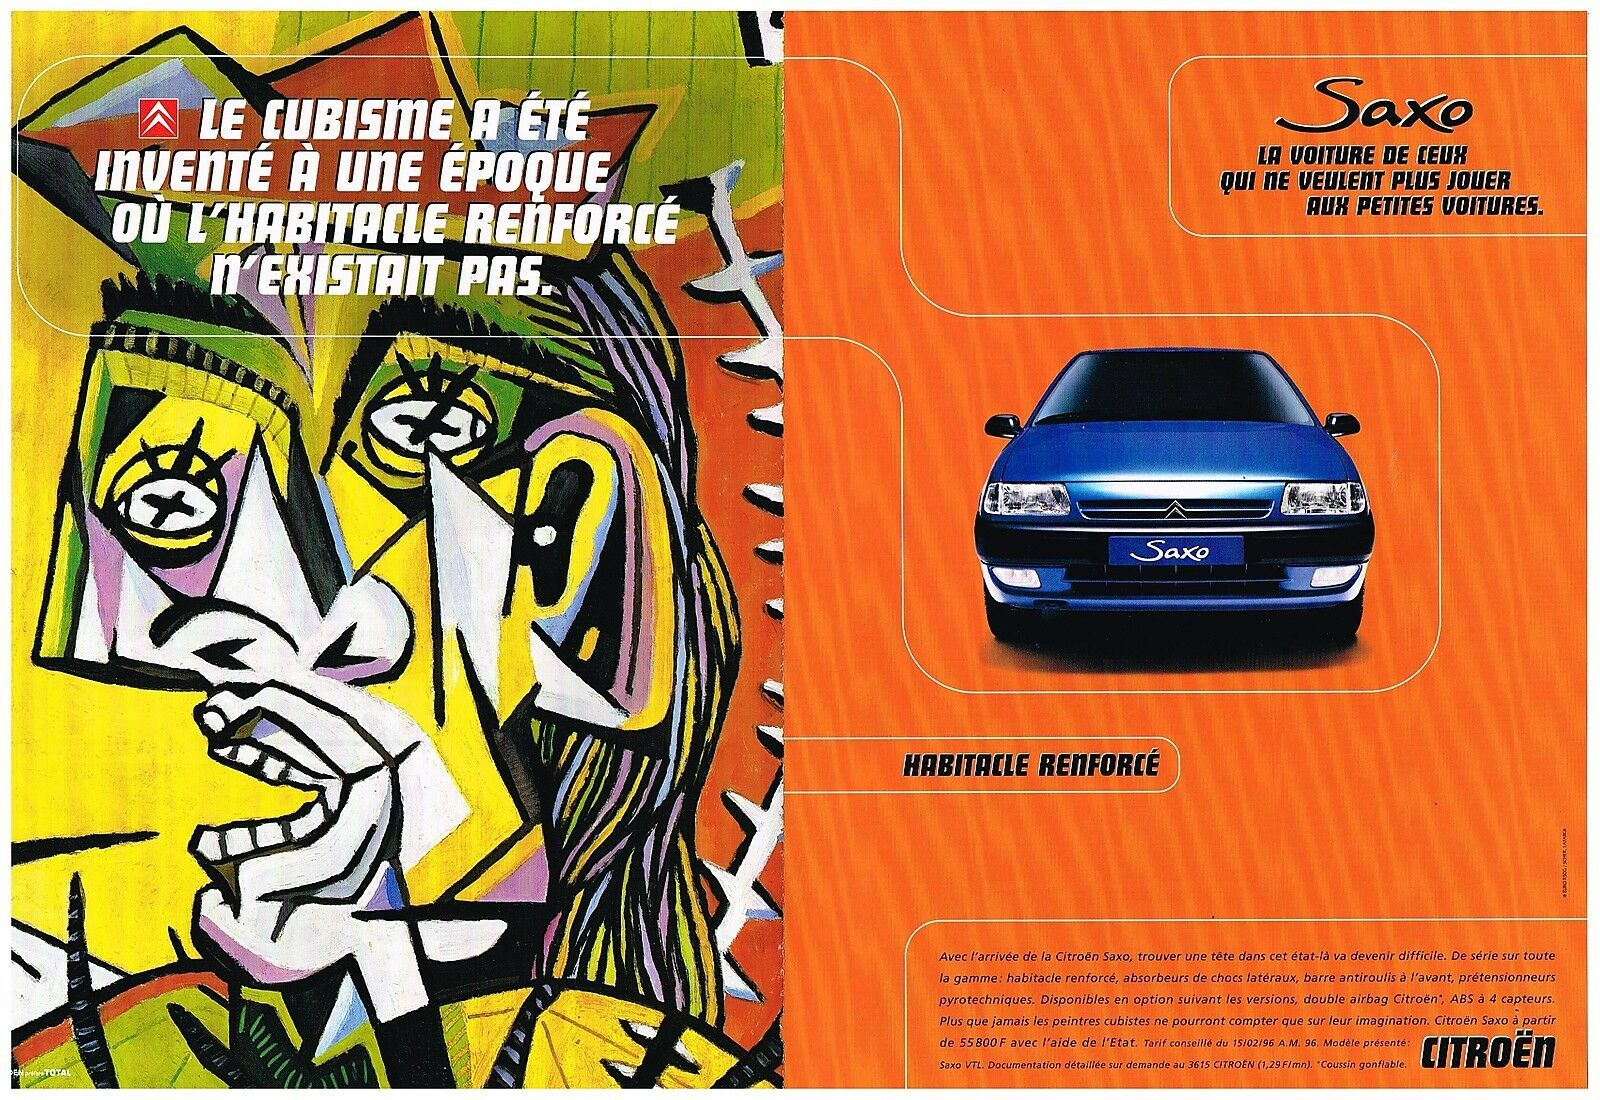 1996 Citroen saxo